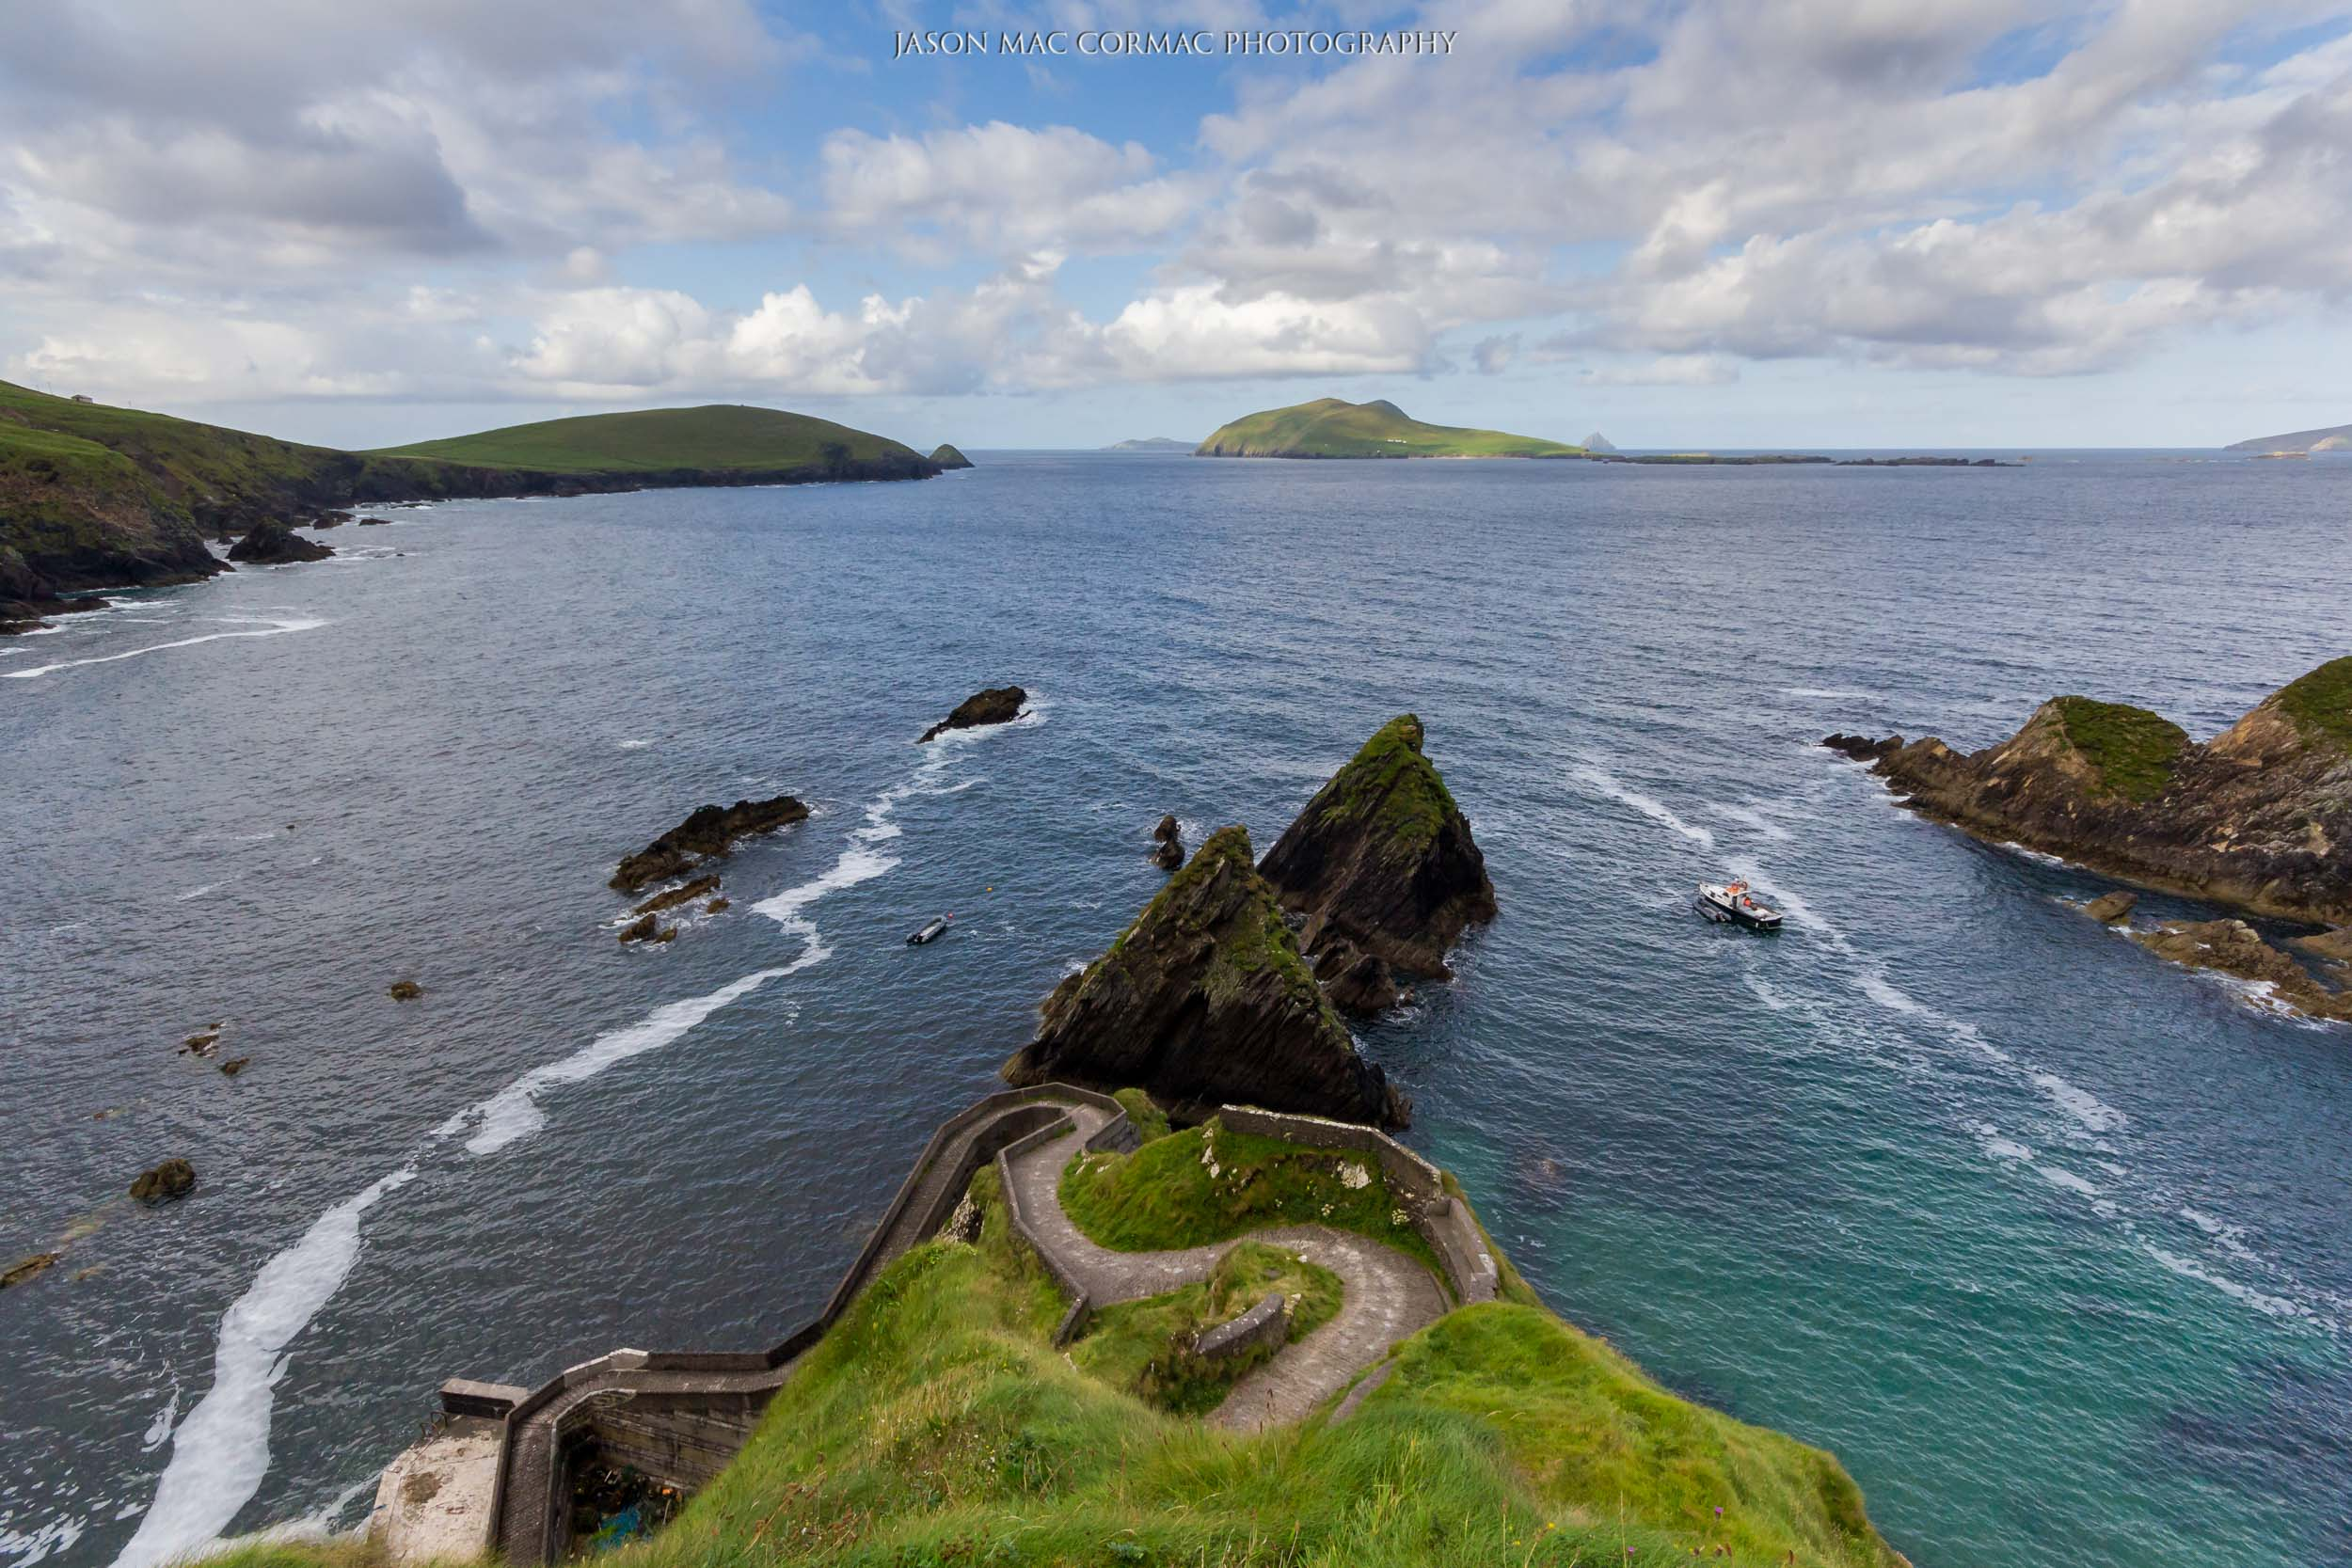 Dunquin Pier, Dingle Peninsula, County Kerry